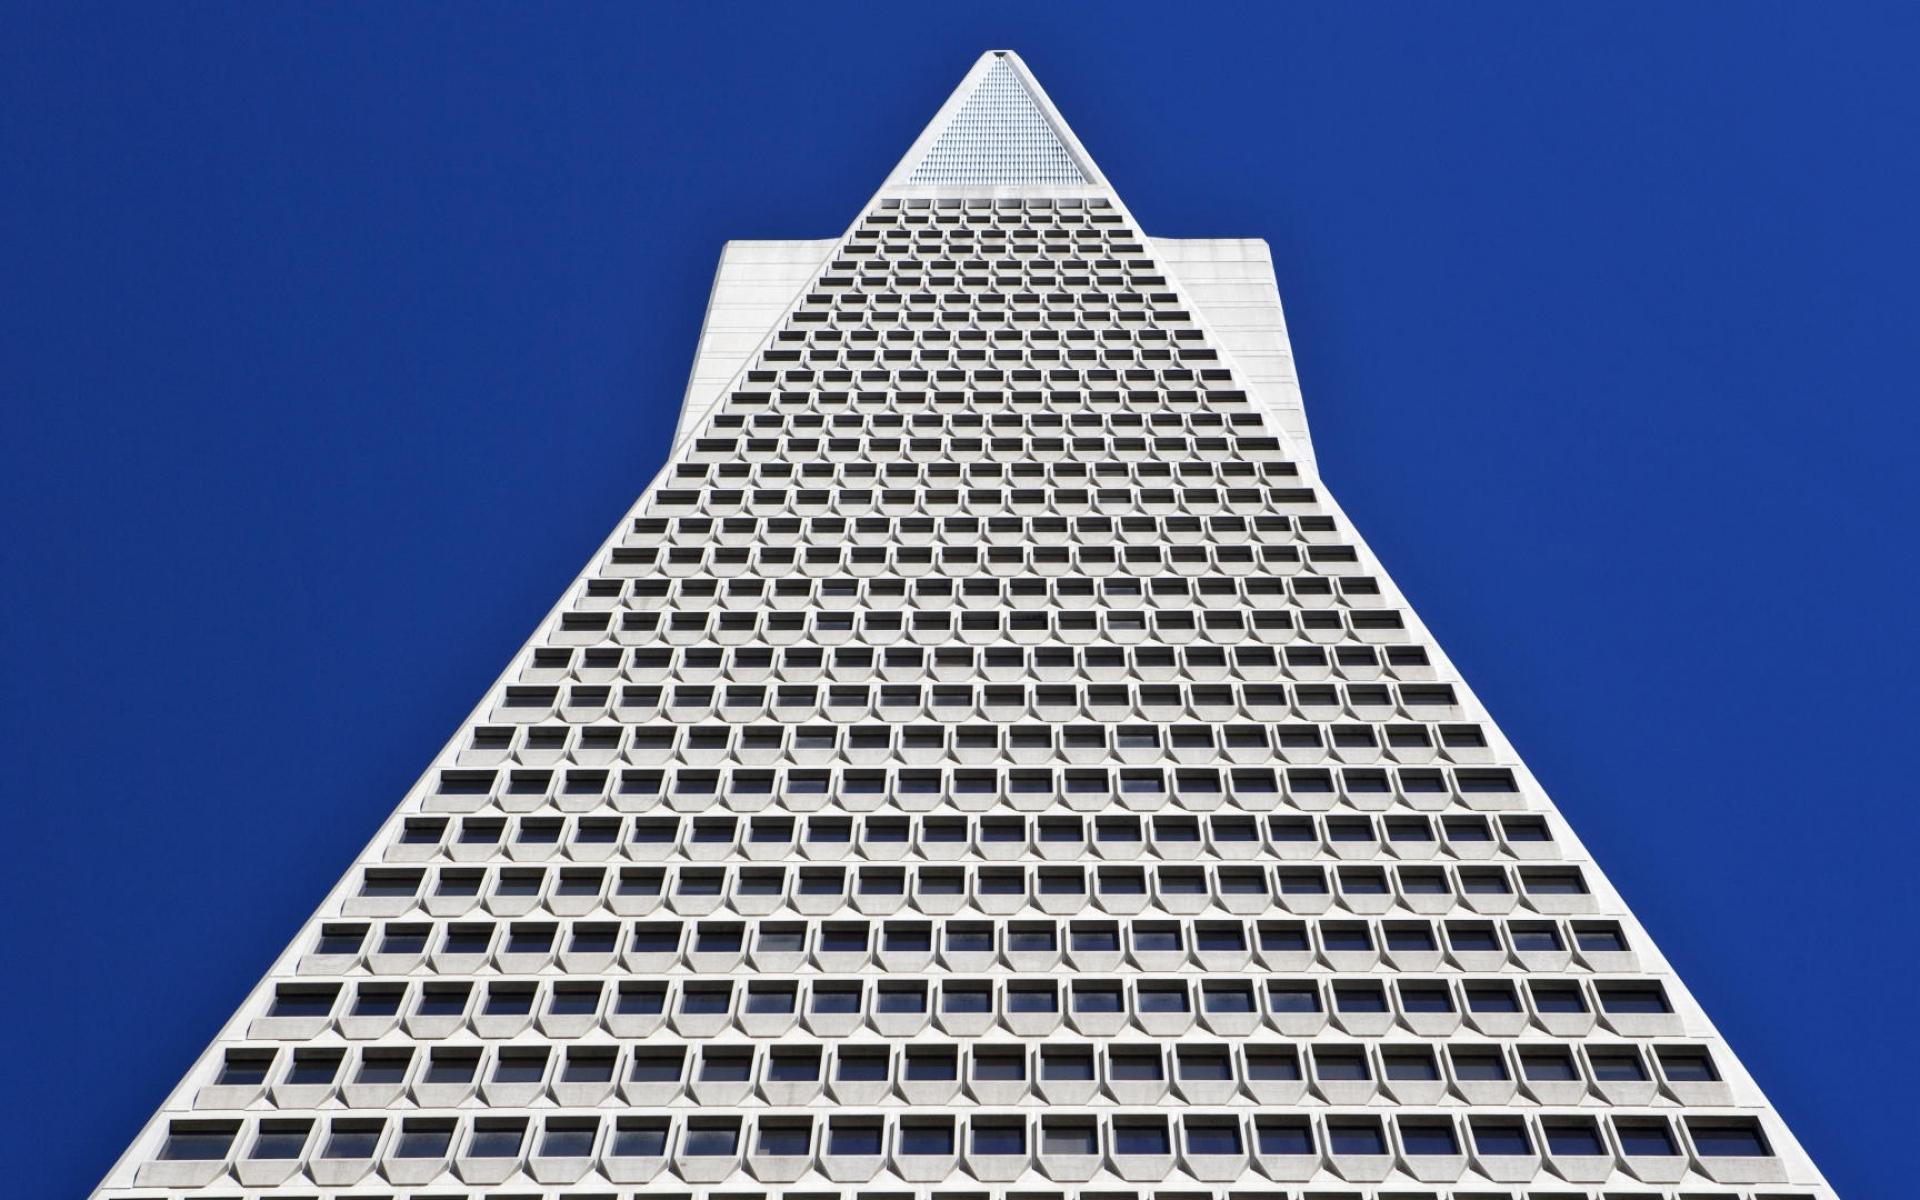 Картинки Пирамида трансамерики, сан-франциско, калифорния, США фото и обои на рабочий стол